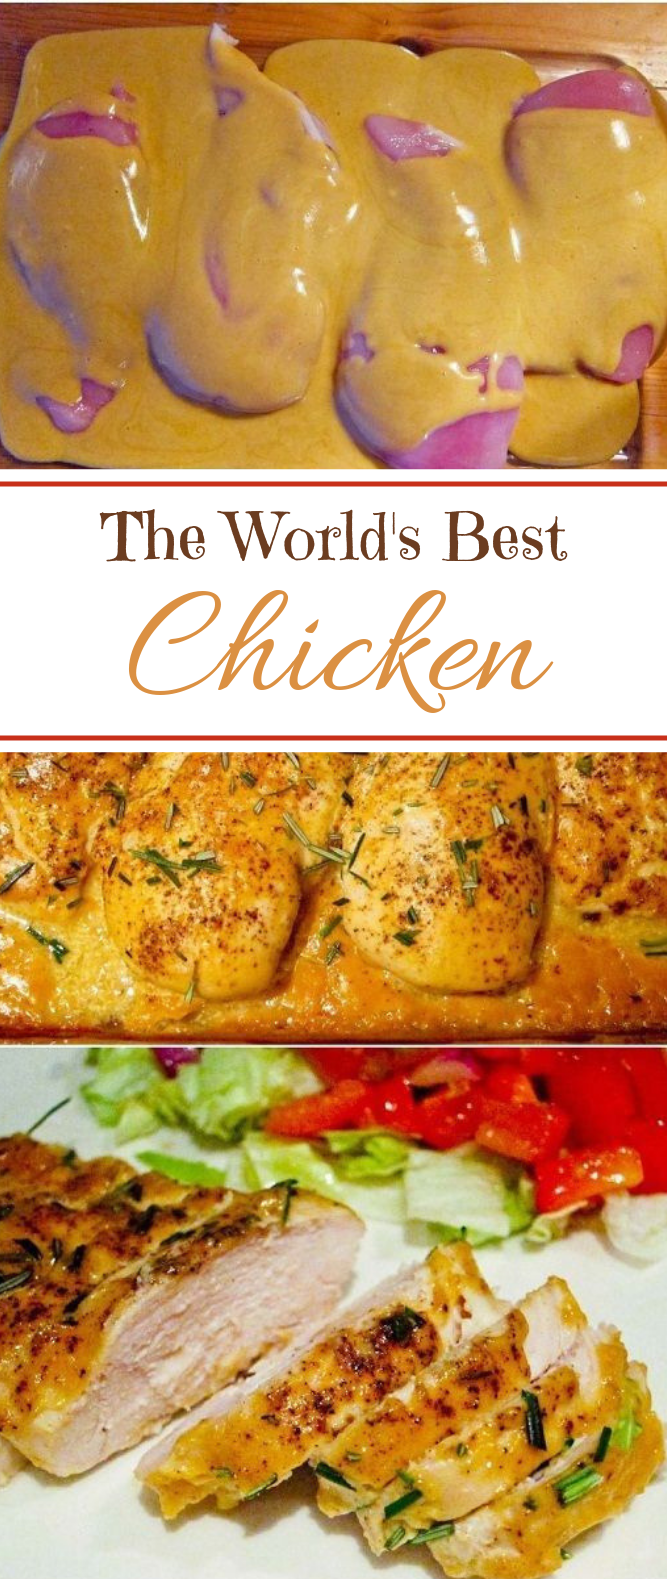 The World's Best Chicken #recipes #dinner